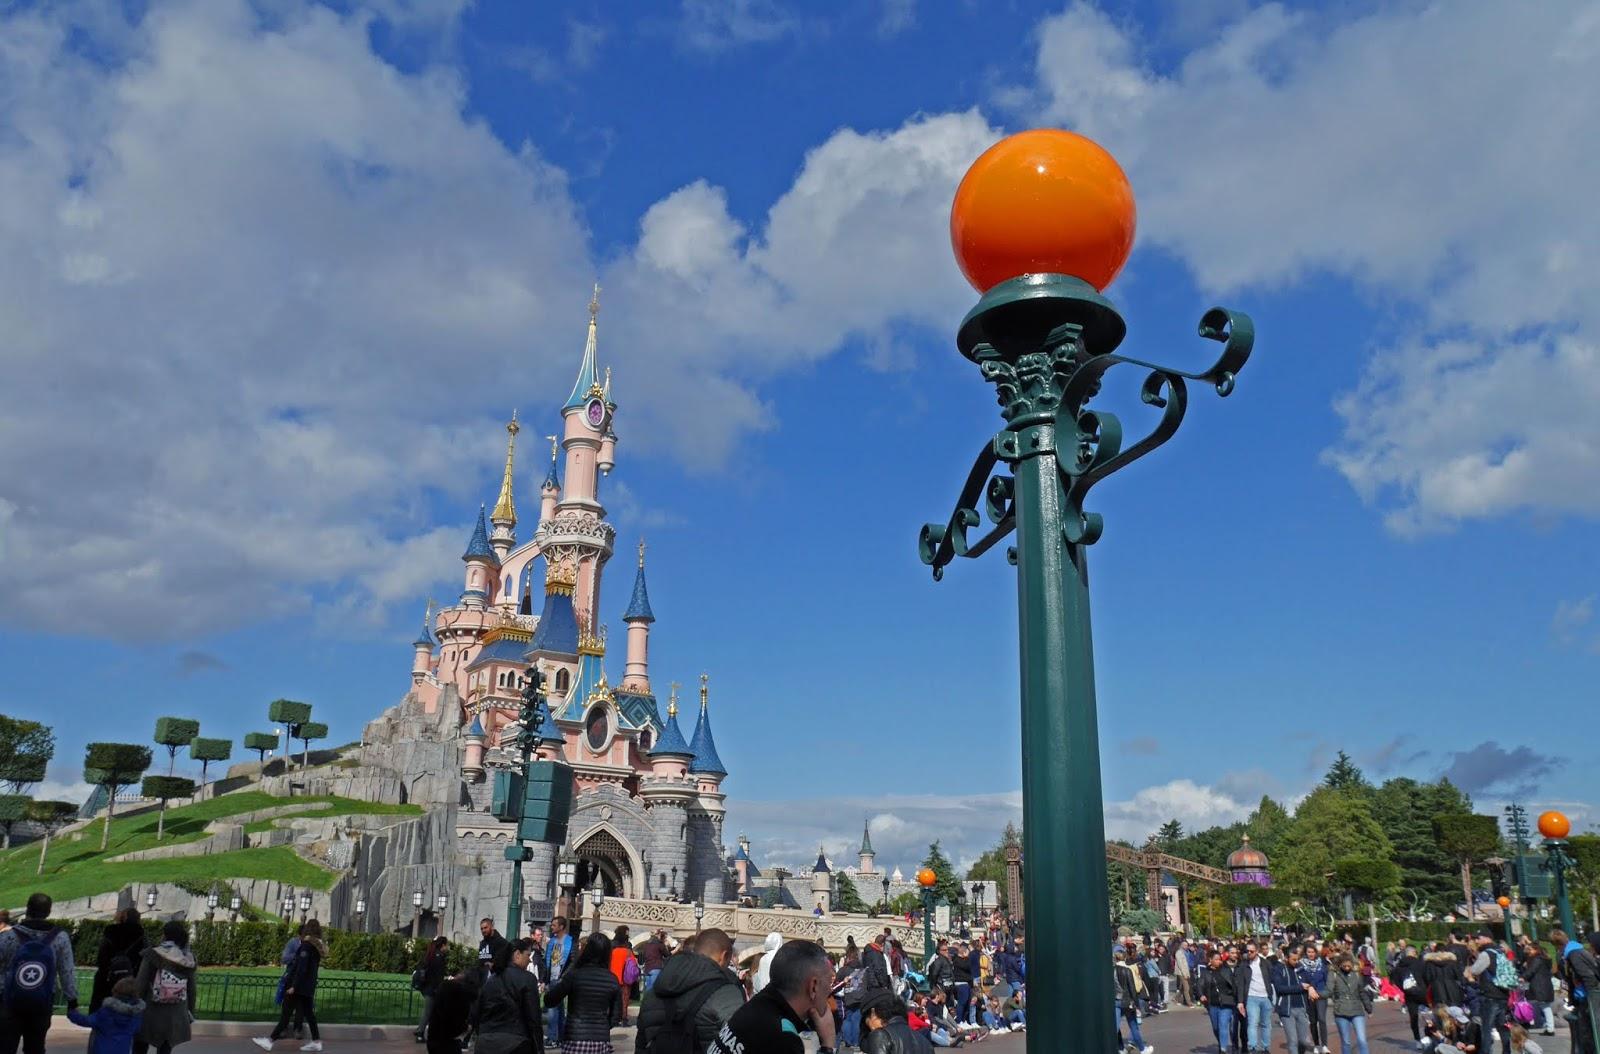 Sleeping Beauty Castle during Halloween season, Disneyland Paris